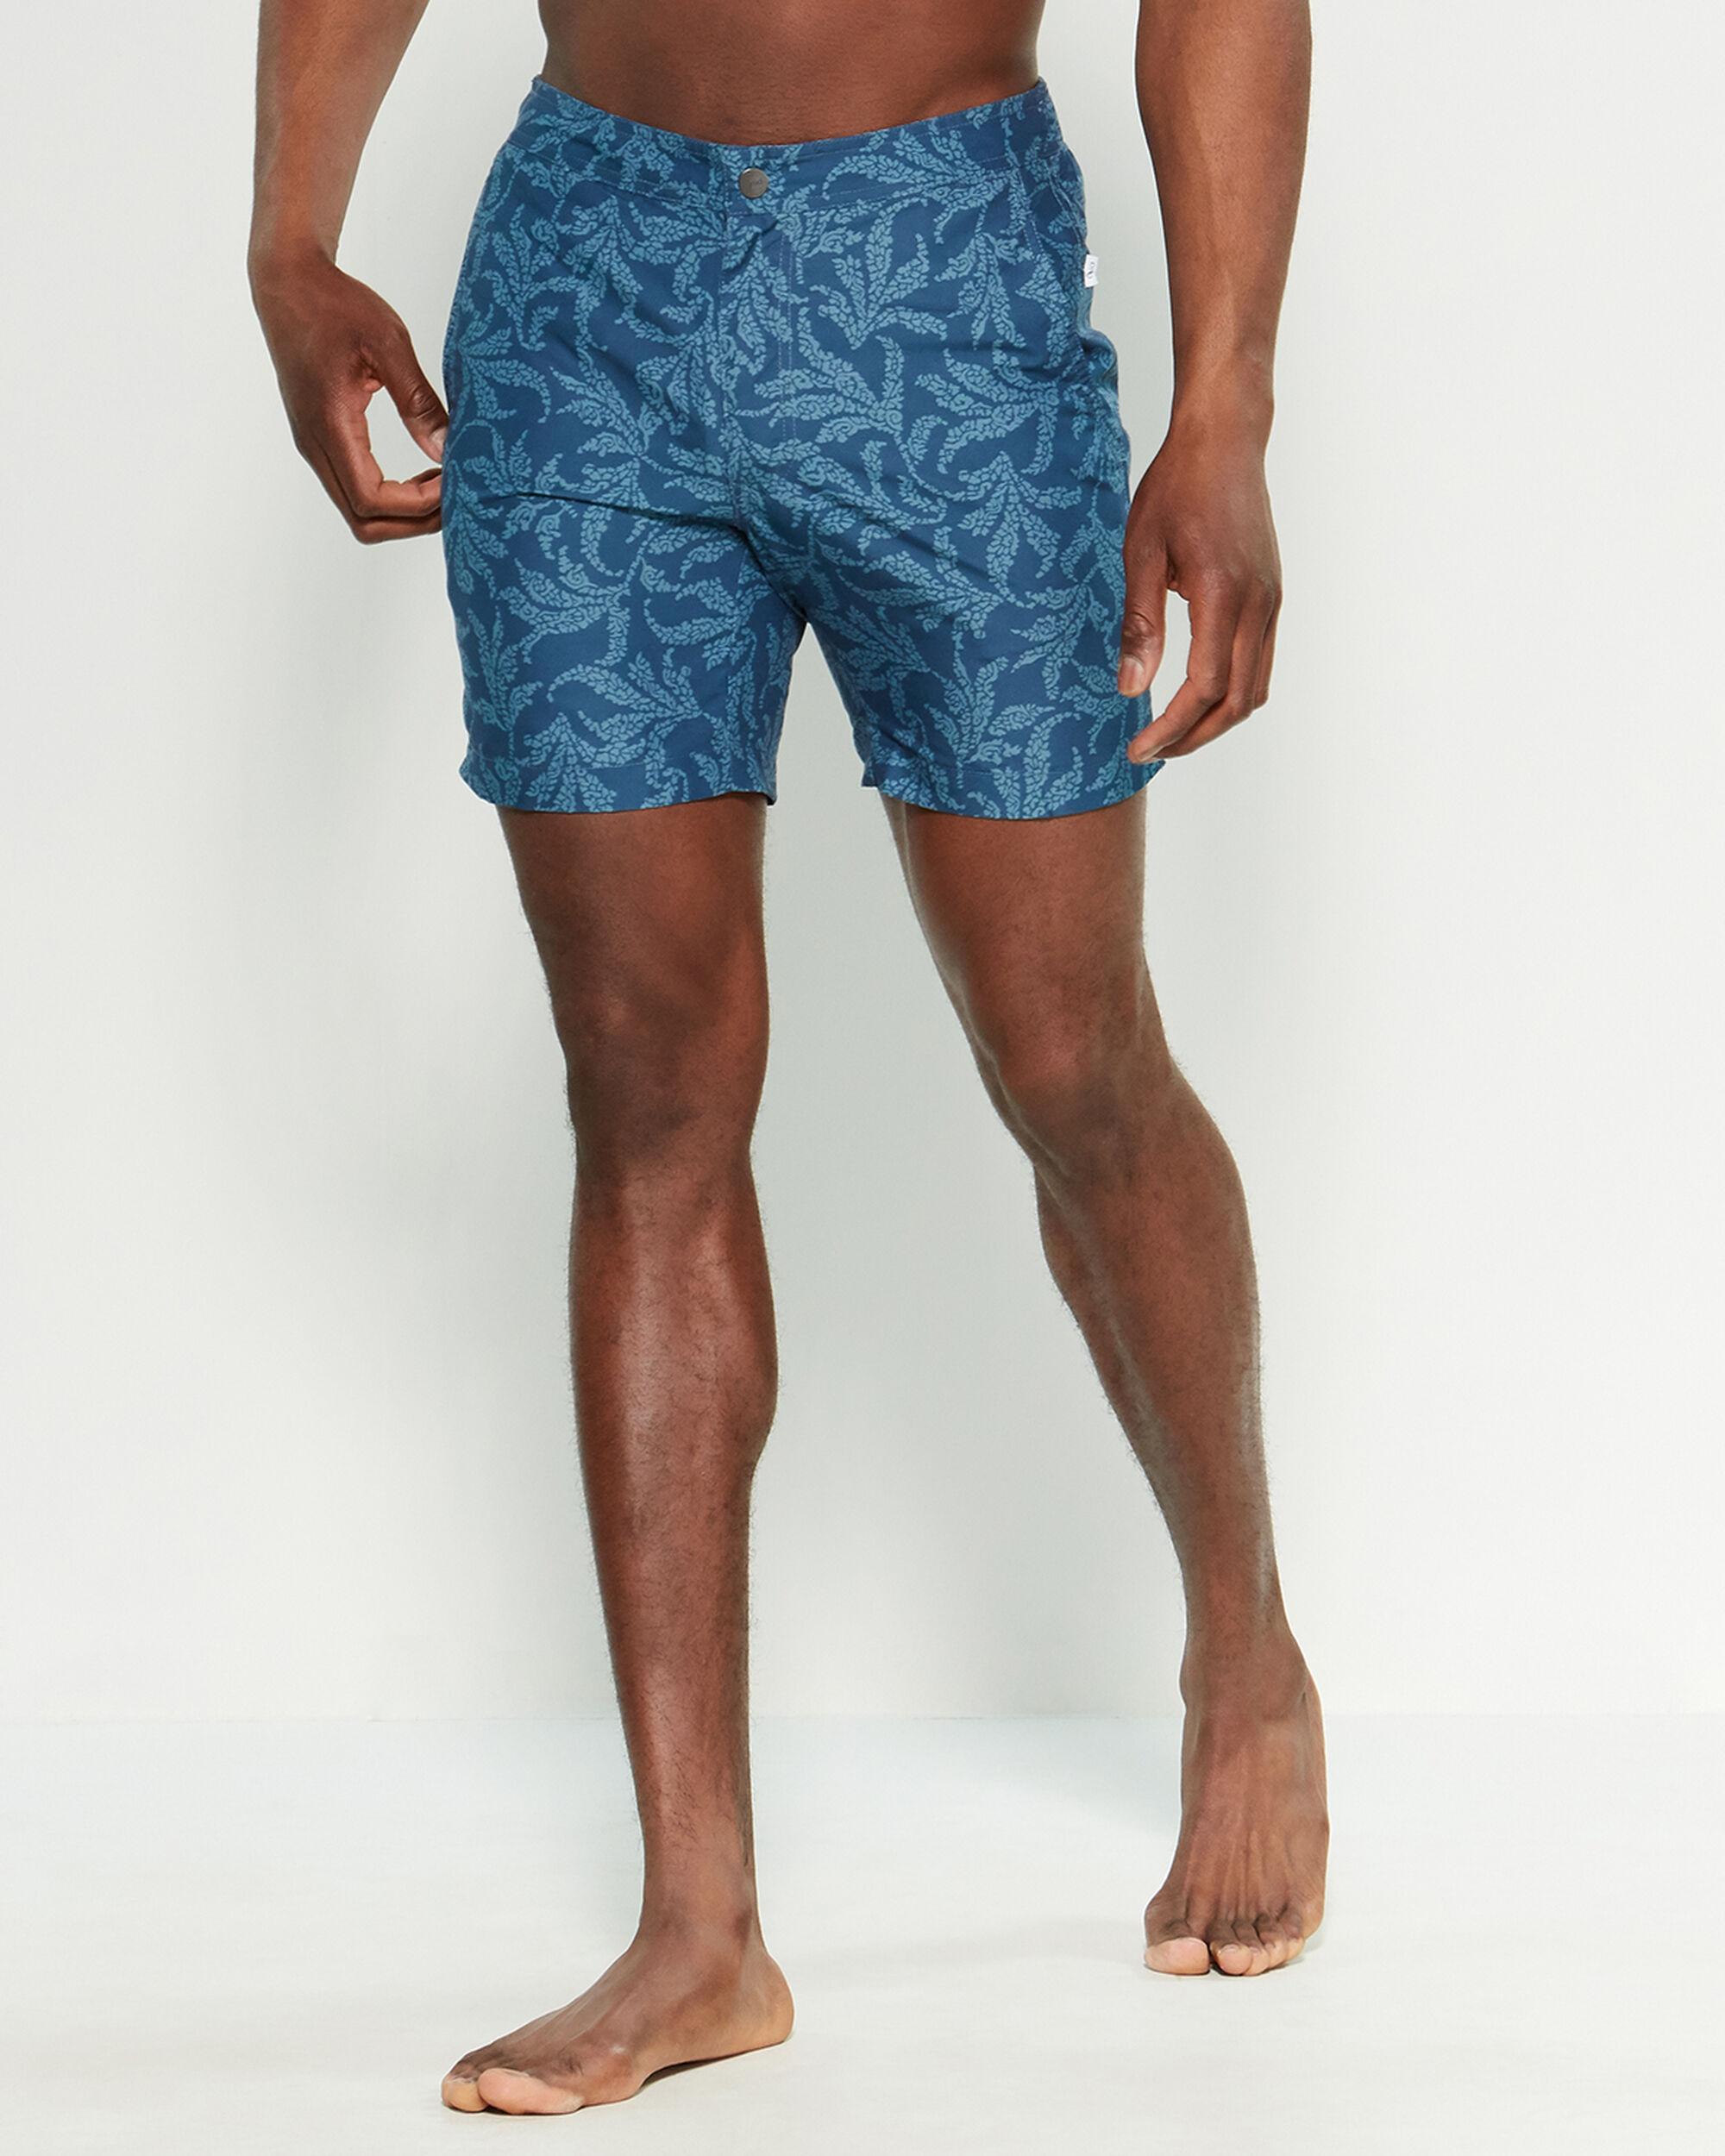 9564c5559d Onia Ensign Blue Coral Paisley Calder Swim Trunks in Blue for Men - Lyst